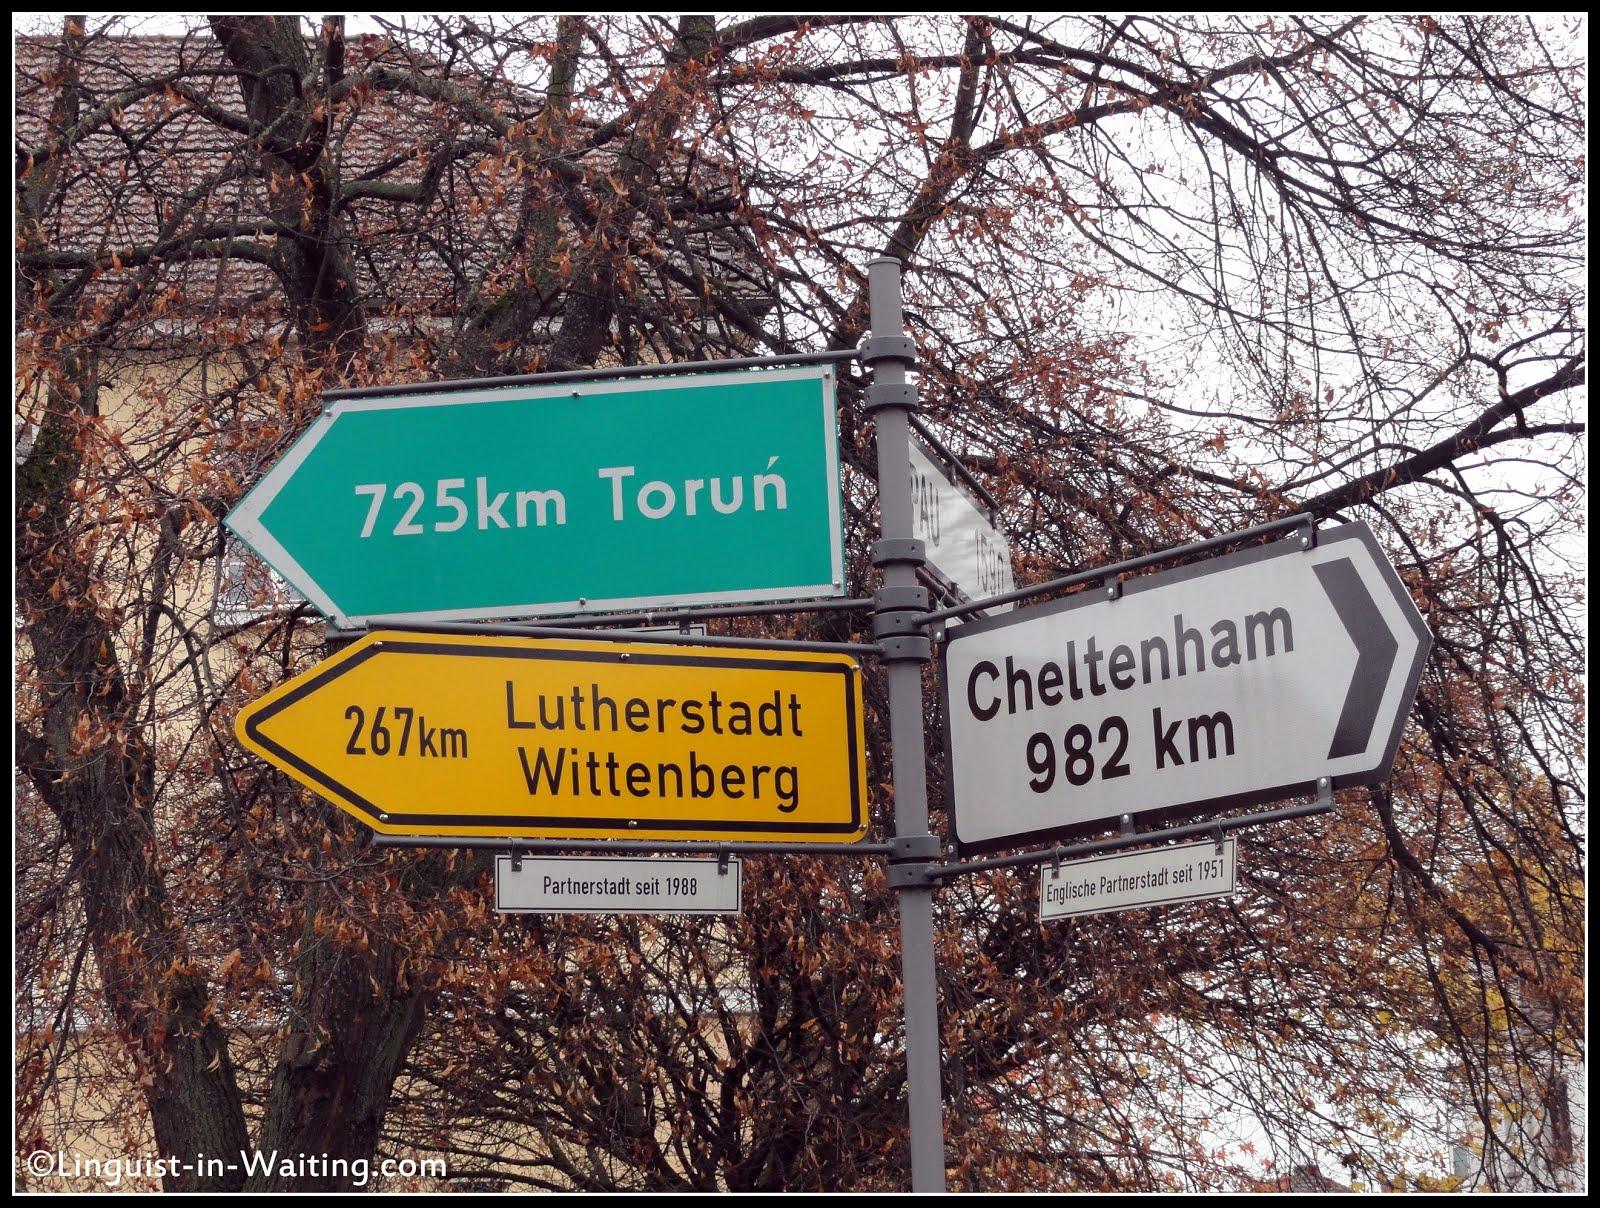 Memoirs of a Traveling Ex Linguist Year 13 Göttingen